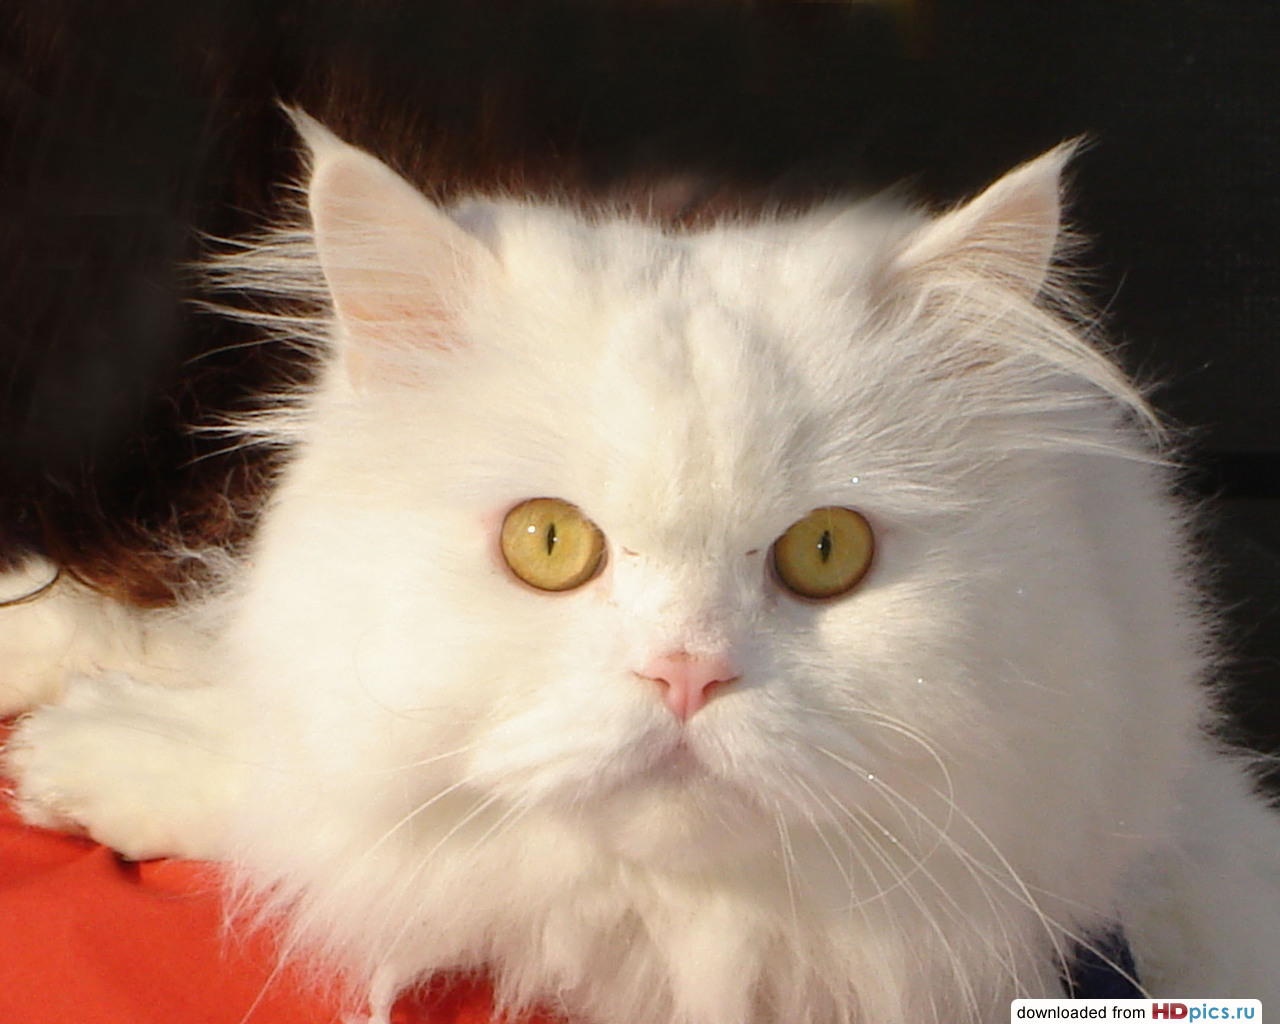 Белый пушистый кот, фото, обои